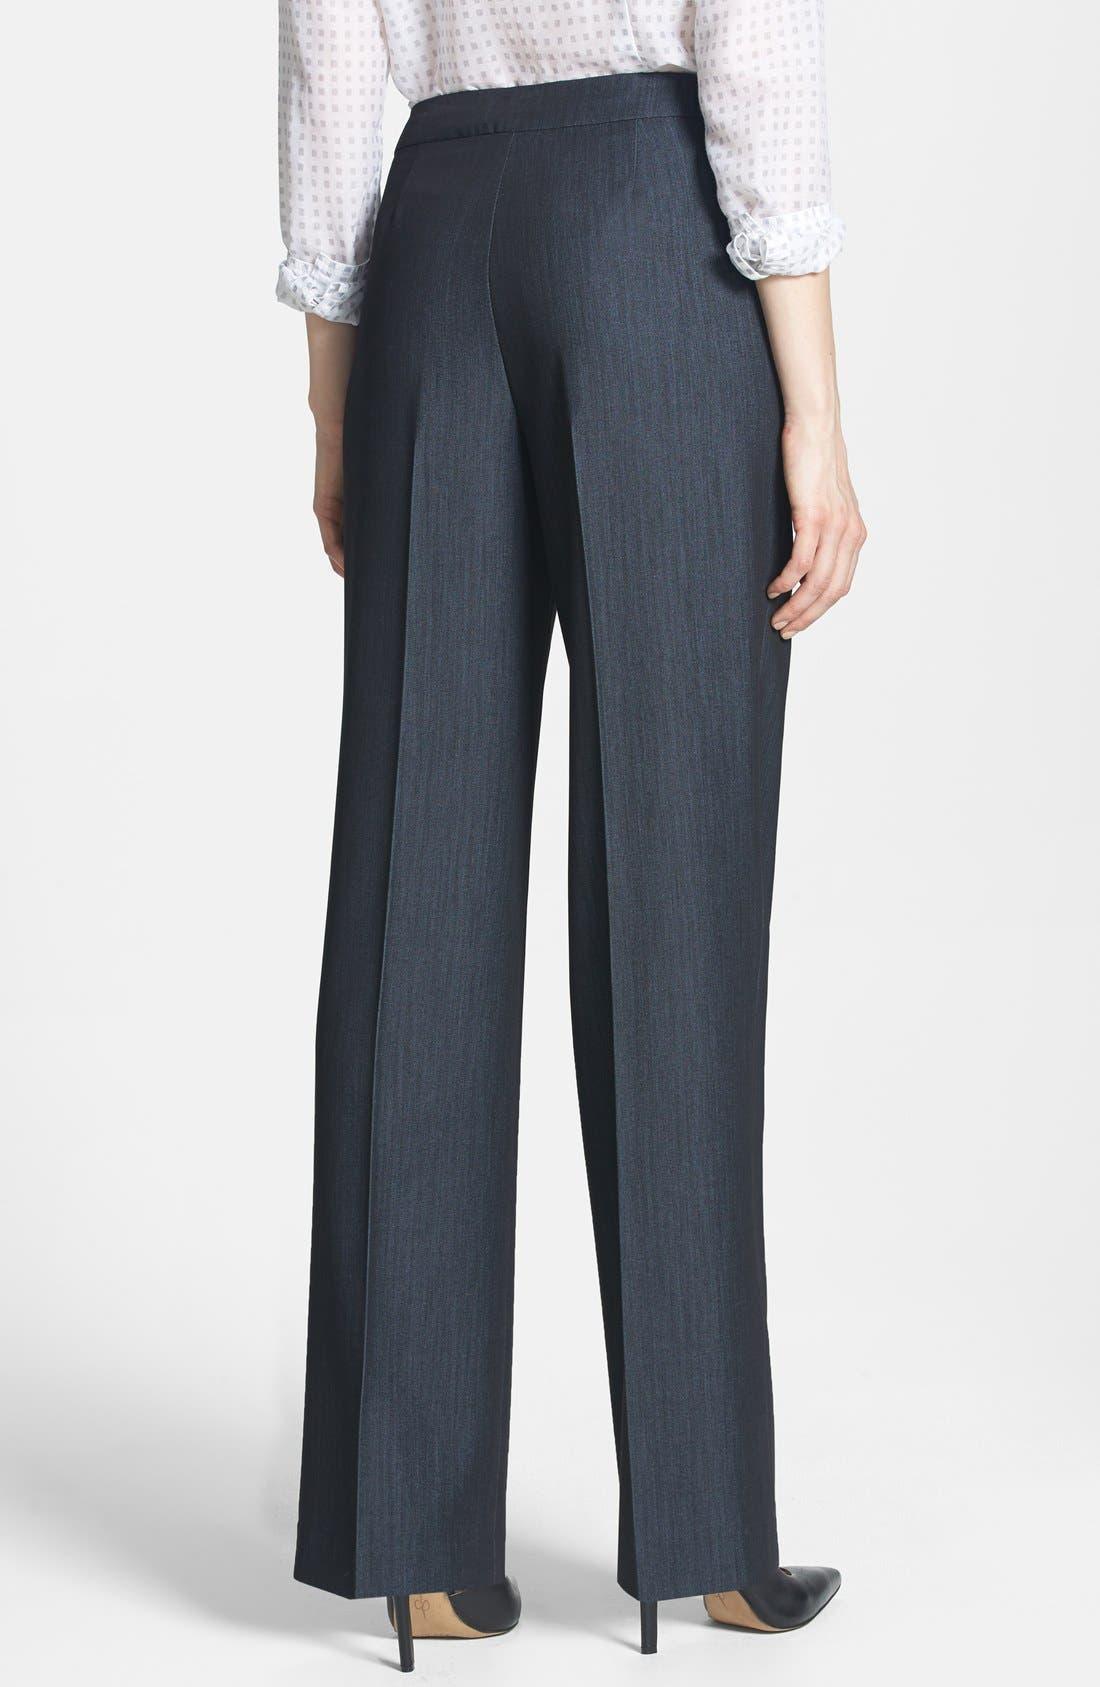 Alternate Image 2  - Jones New York 'Sloane' Stretch Denim Mid Rise Pants (Regular & Petite)